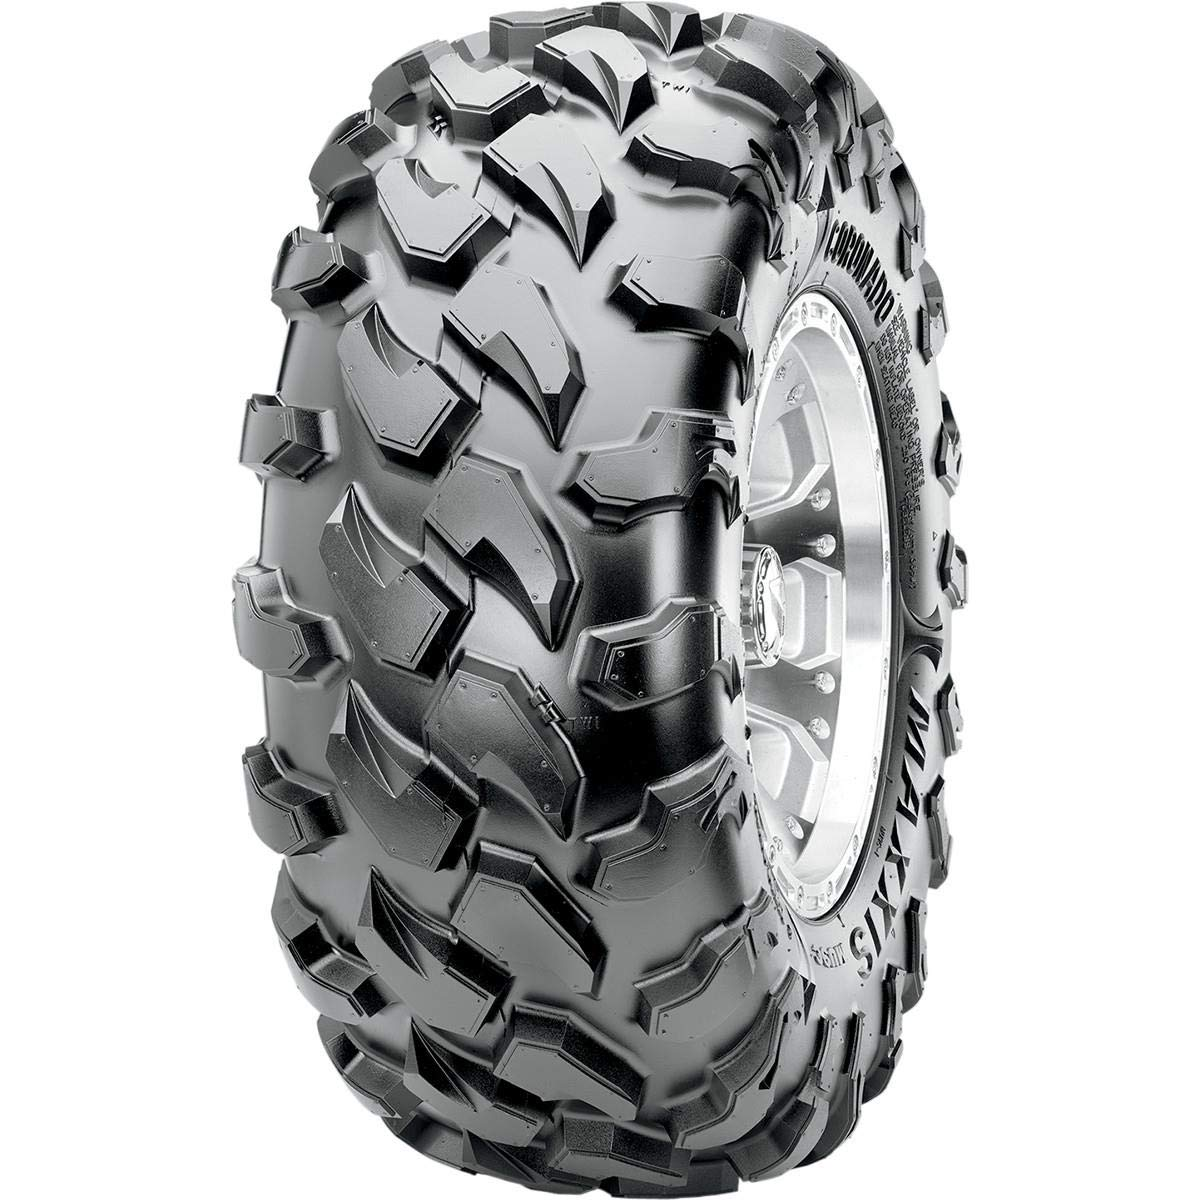 Maxxis MU9C Coronado Rear Tire - 27x11R14, Position: Rear, Rim Size: 14, Tire Application: Intermediate, Tire Size: 27x11x14, Tire Type: ATV/UTV, Tire Construction: Radial, Tire Ply: 8 TM00842100 4333407703